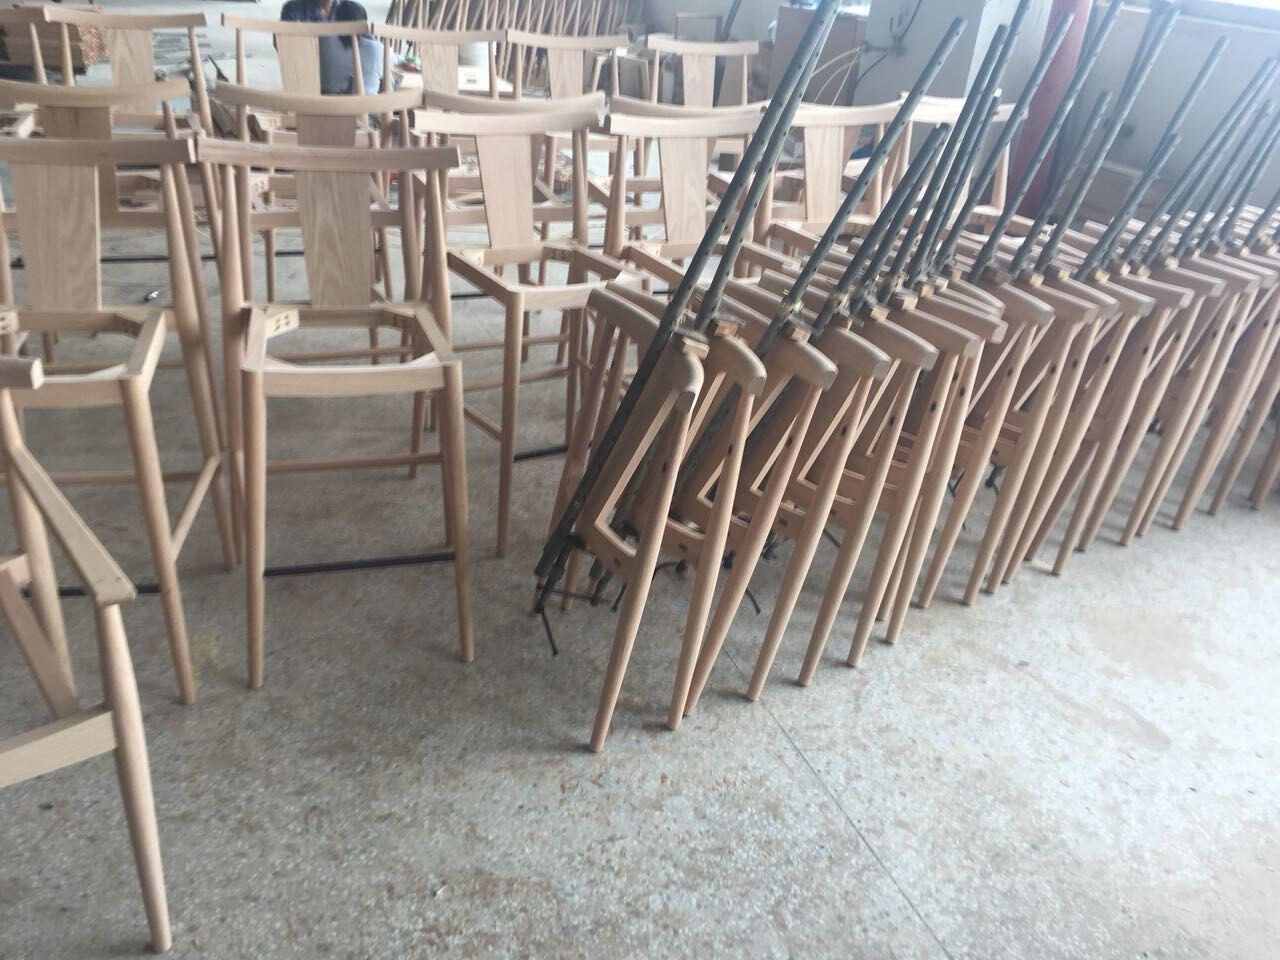 Bar Chair/Bar Stool/Hotel Furniture/Restaurant Furniture/Dining Chair/Canteen Furniture/Caffee Club Furniture/Caffee Shop Chair (NCHBC-001)